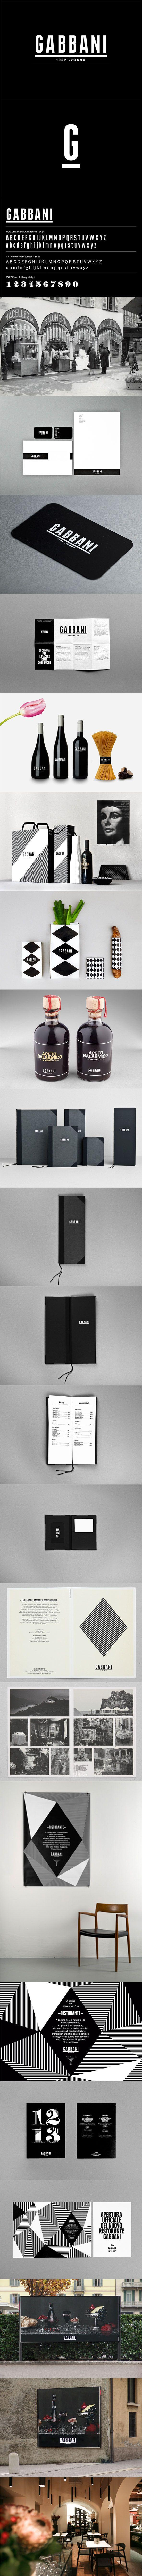 here you go Angel, Gabbani #identity #packaging #branding #marketing PD #graphic